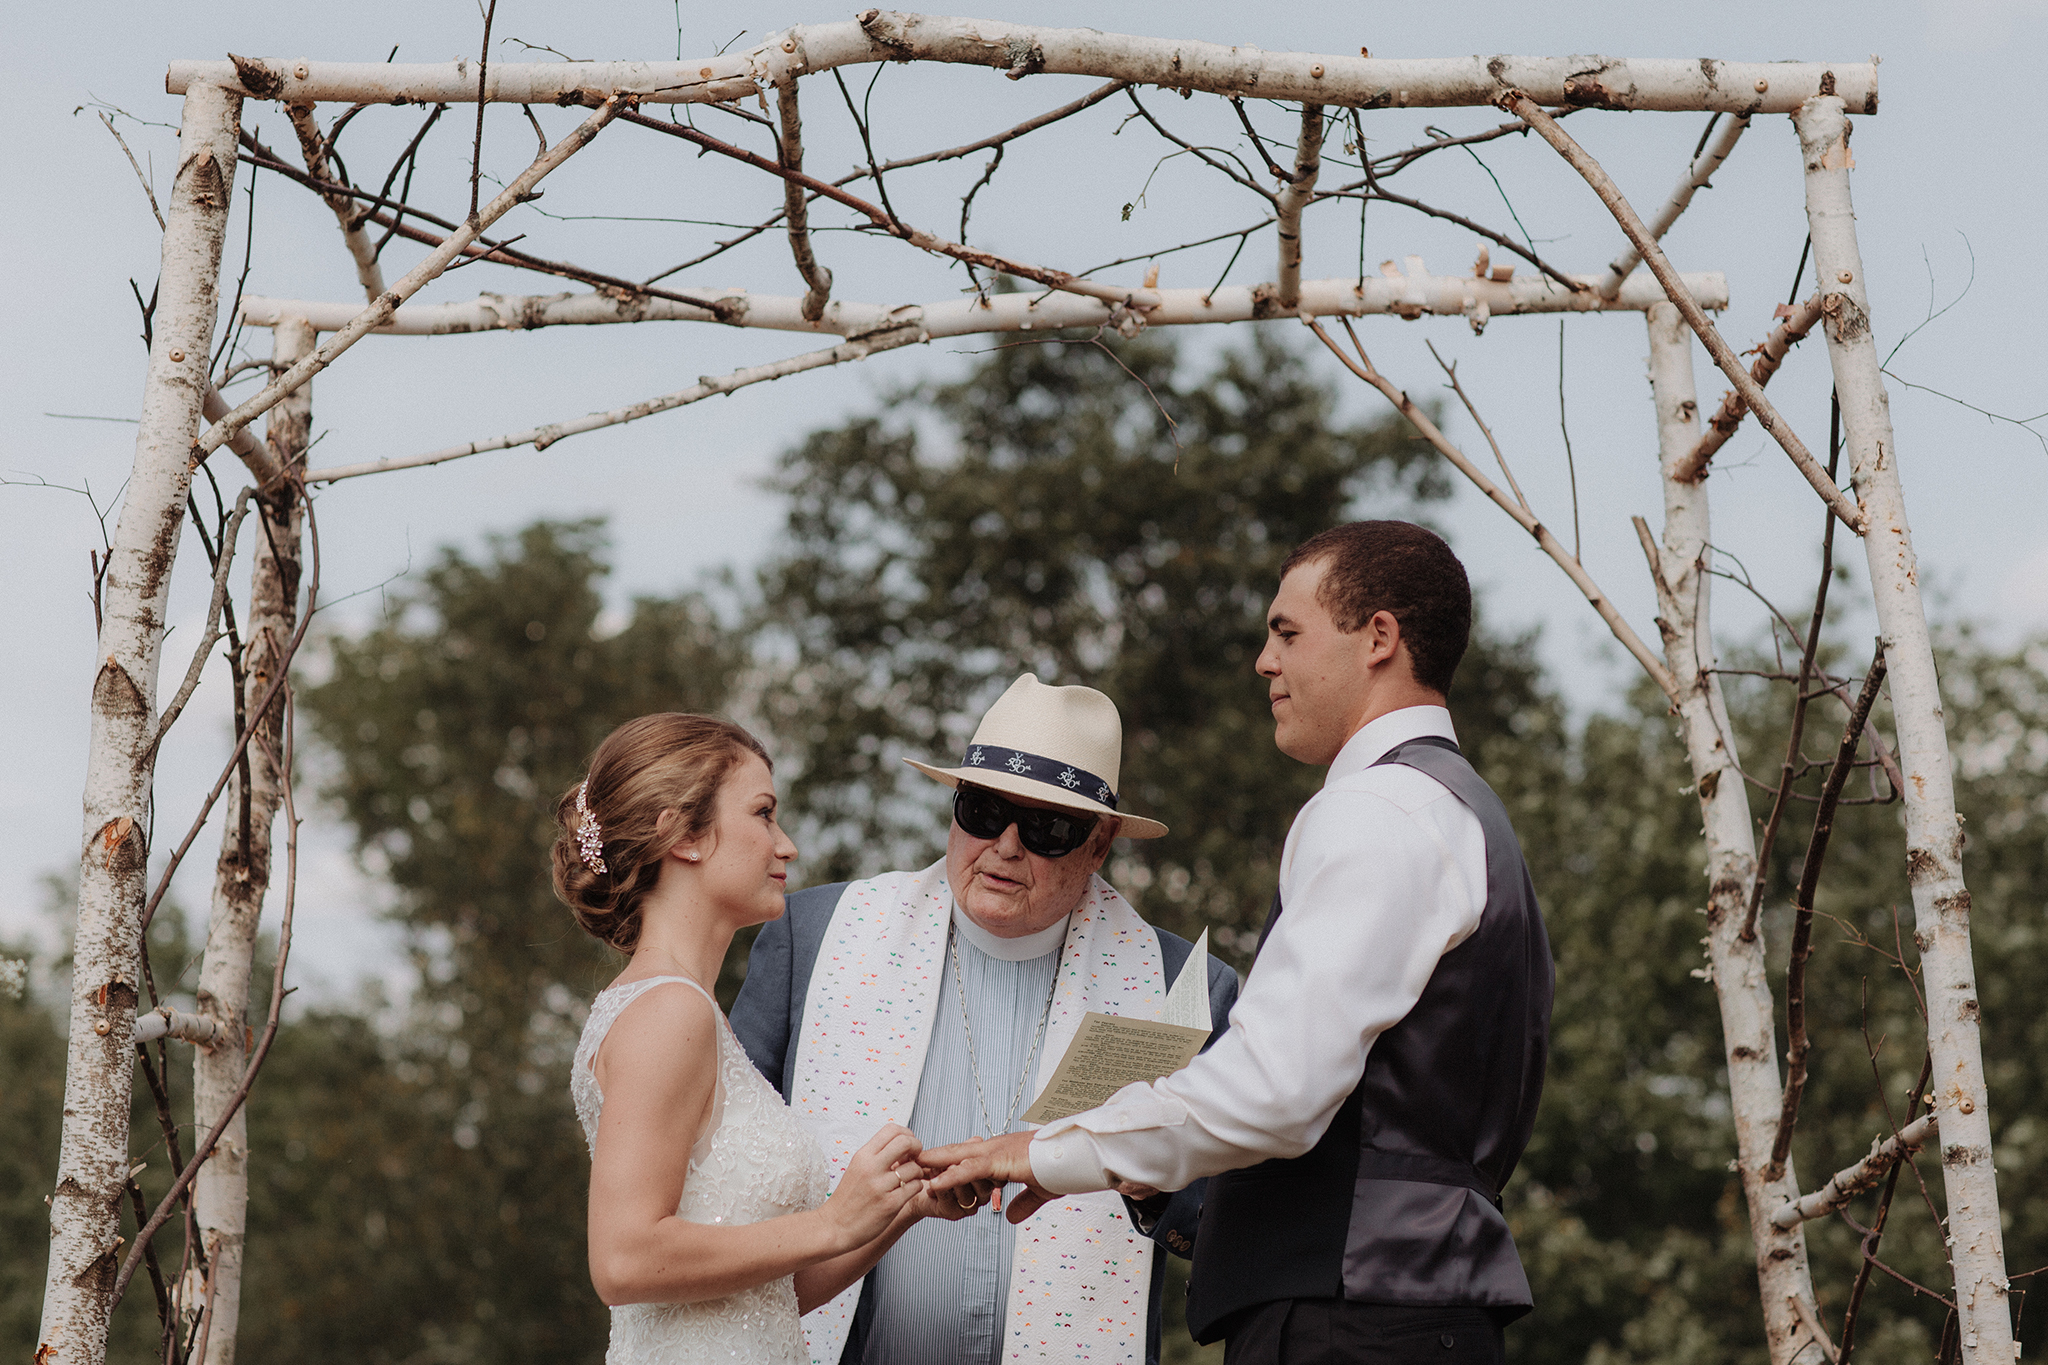 vermont-wedding-photographer-outdoor-farm-wedding-15.jpg